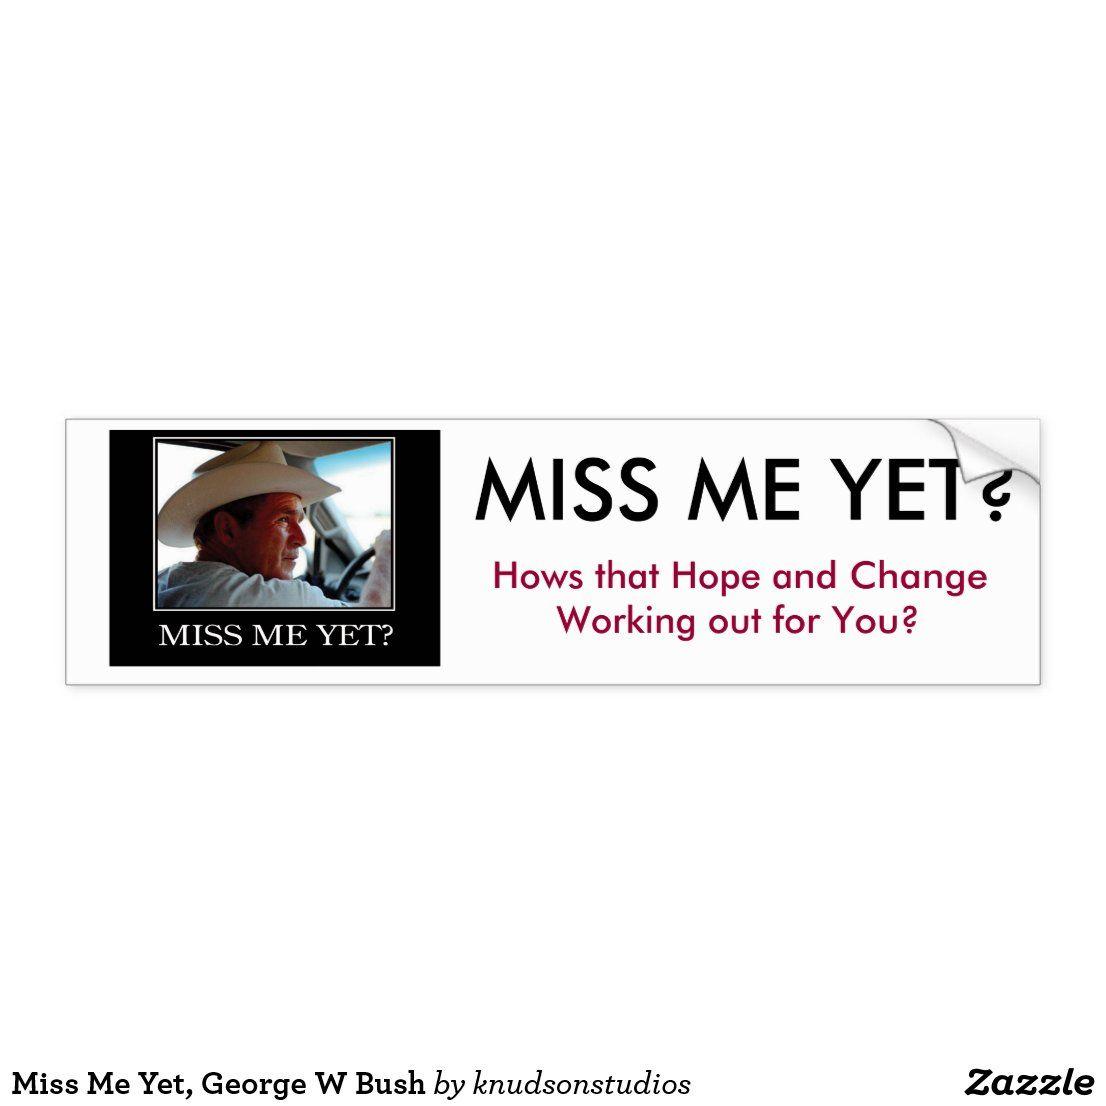 Miss Me Yet George W Bush Bumper Sticker Zazzle Com Bumper Stickers Bumpers Strong Adhesive [ 1106 x 1106 Pixel ]